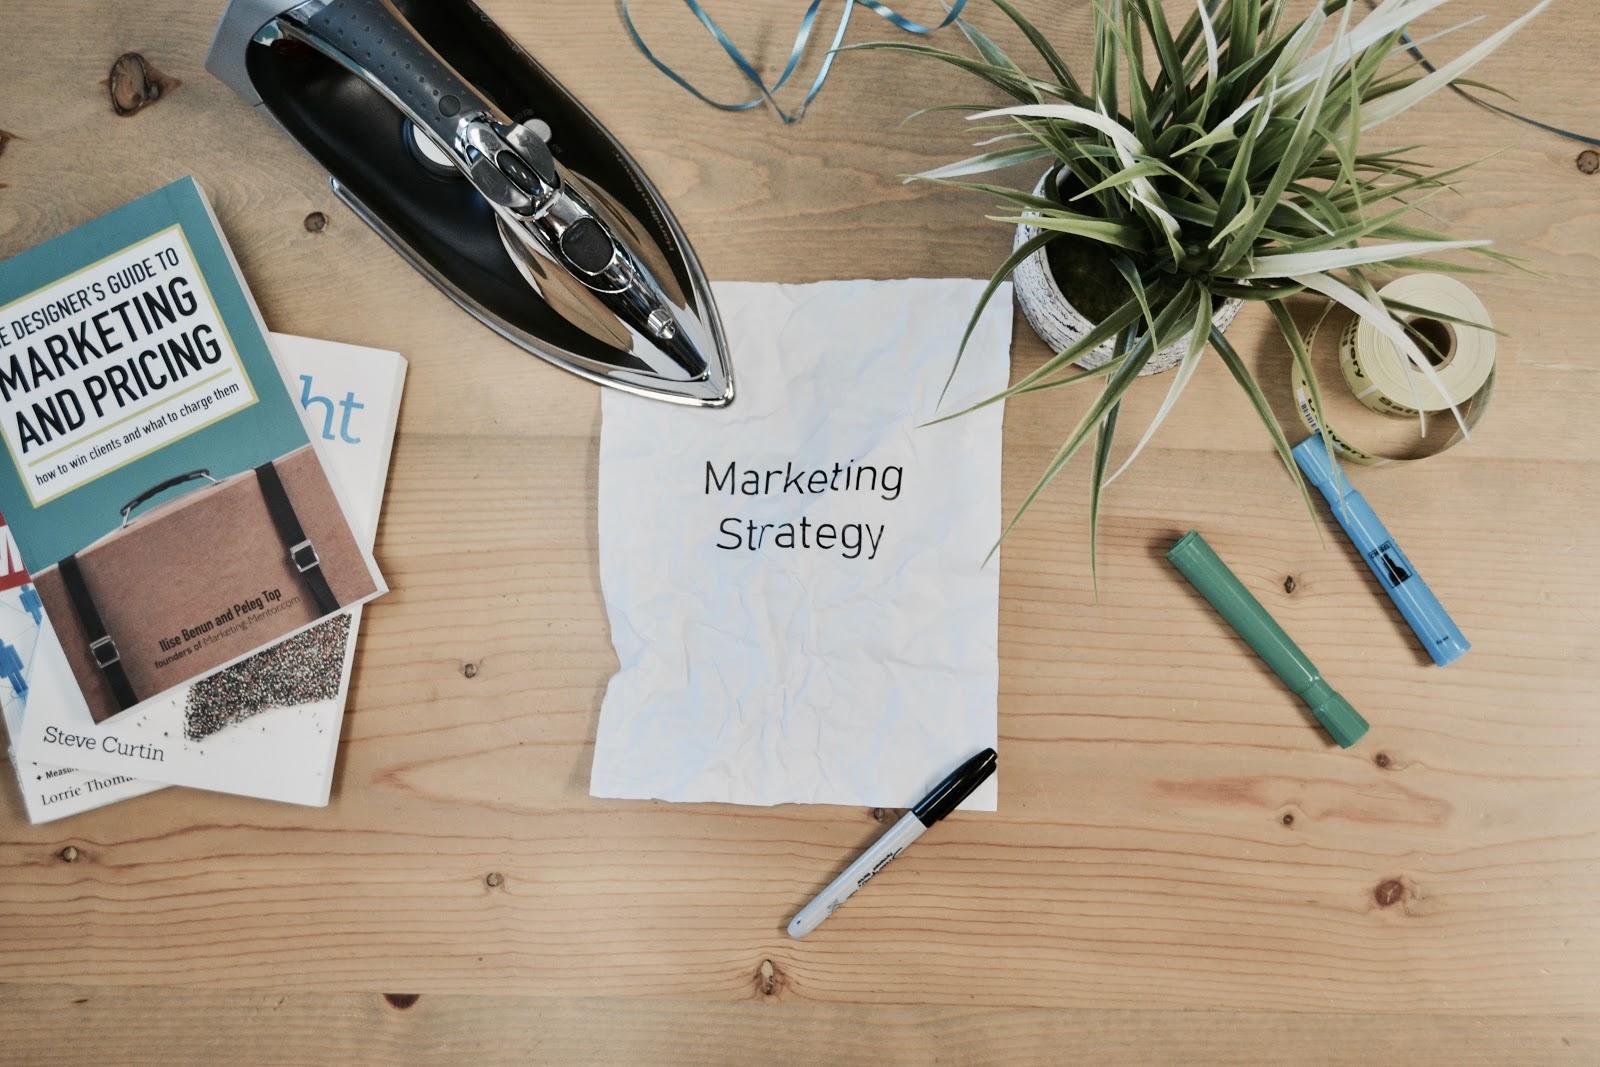 Marketing strategy in digital marketing CC: Campaign Creators on Unsplash